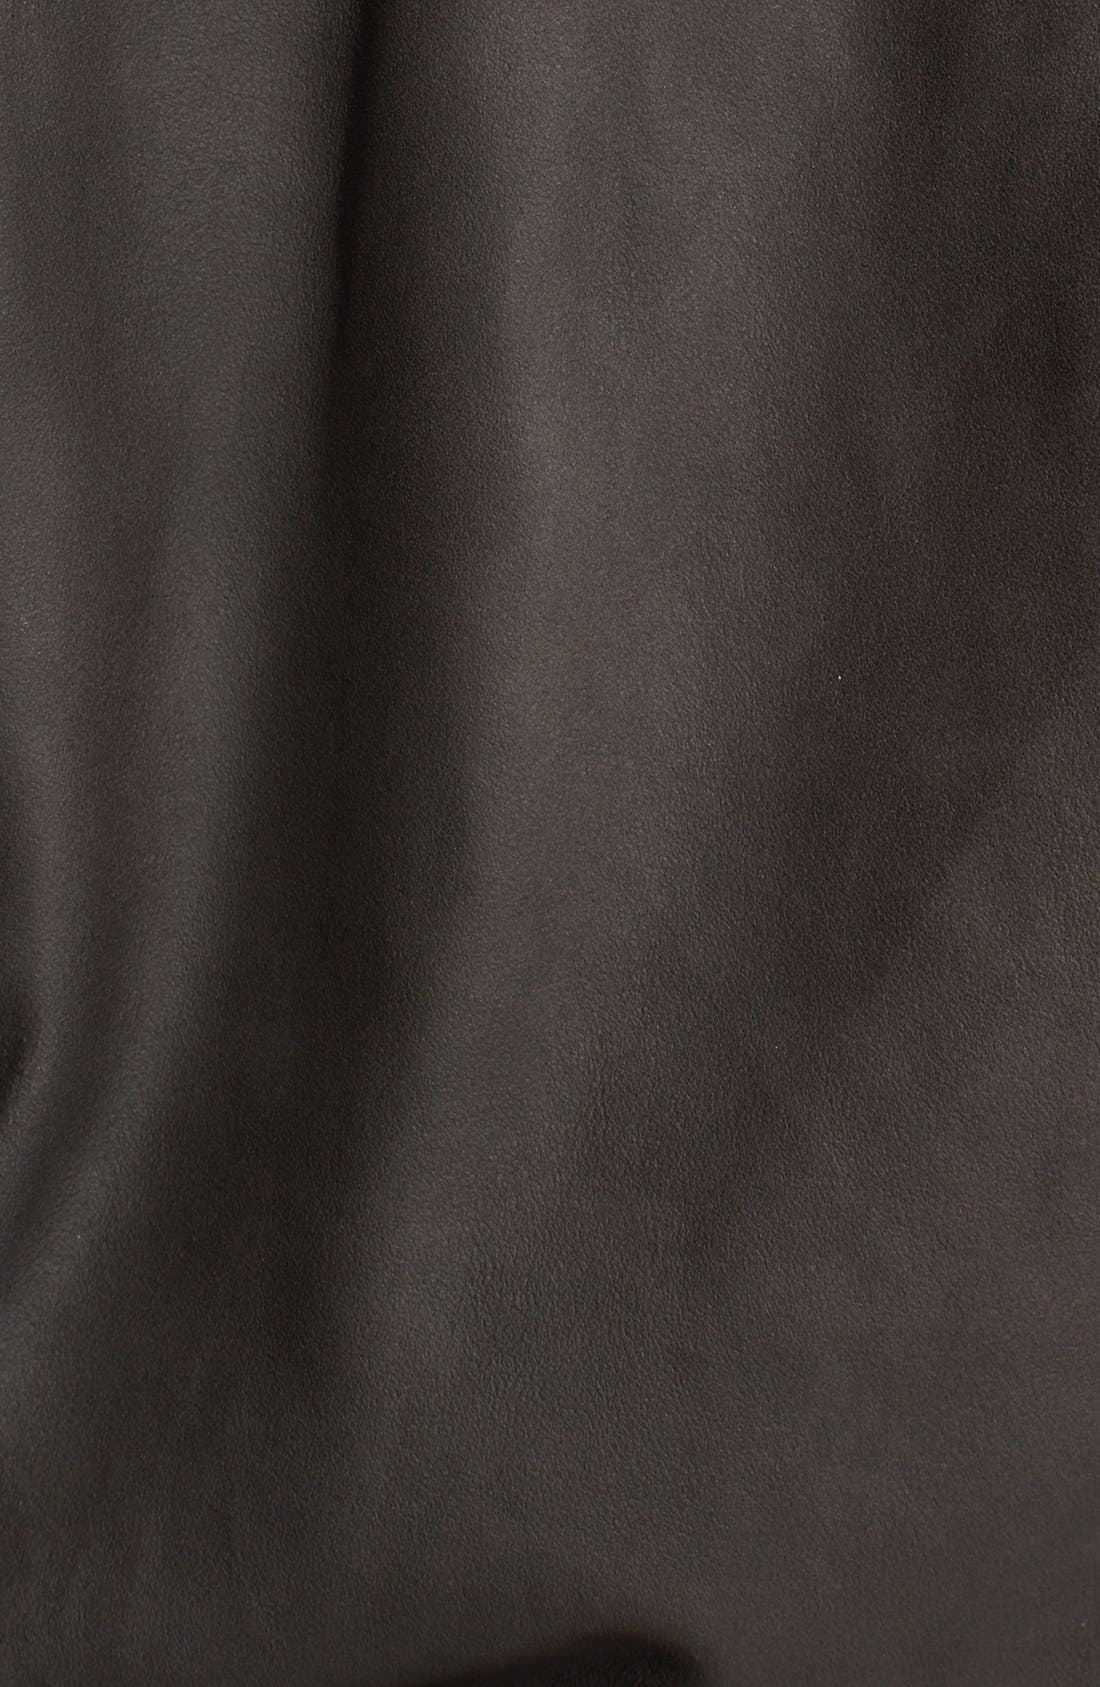 Alternate Image 3  - Elizabeth and James 'Tatum' Leather Sweatshirt Jacket